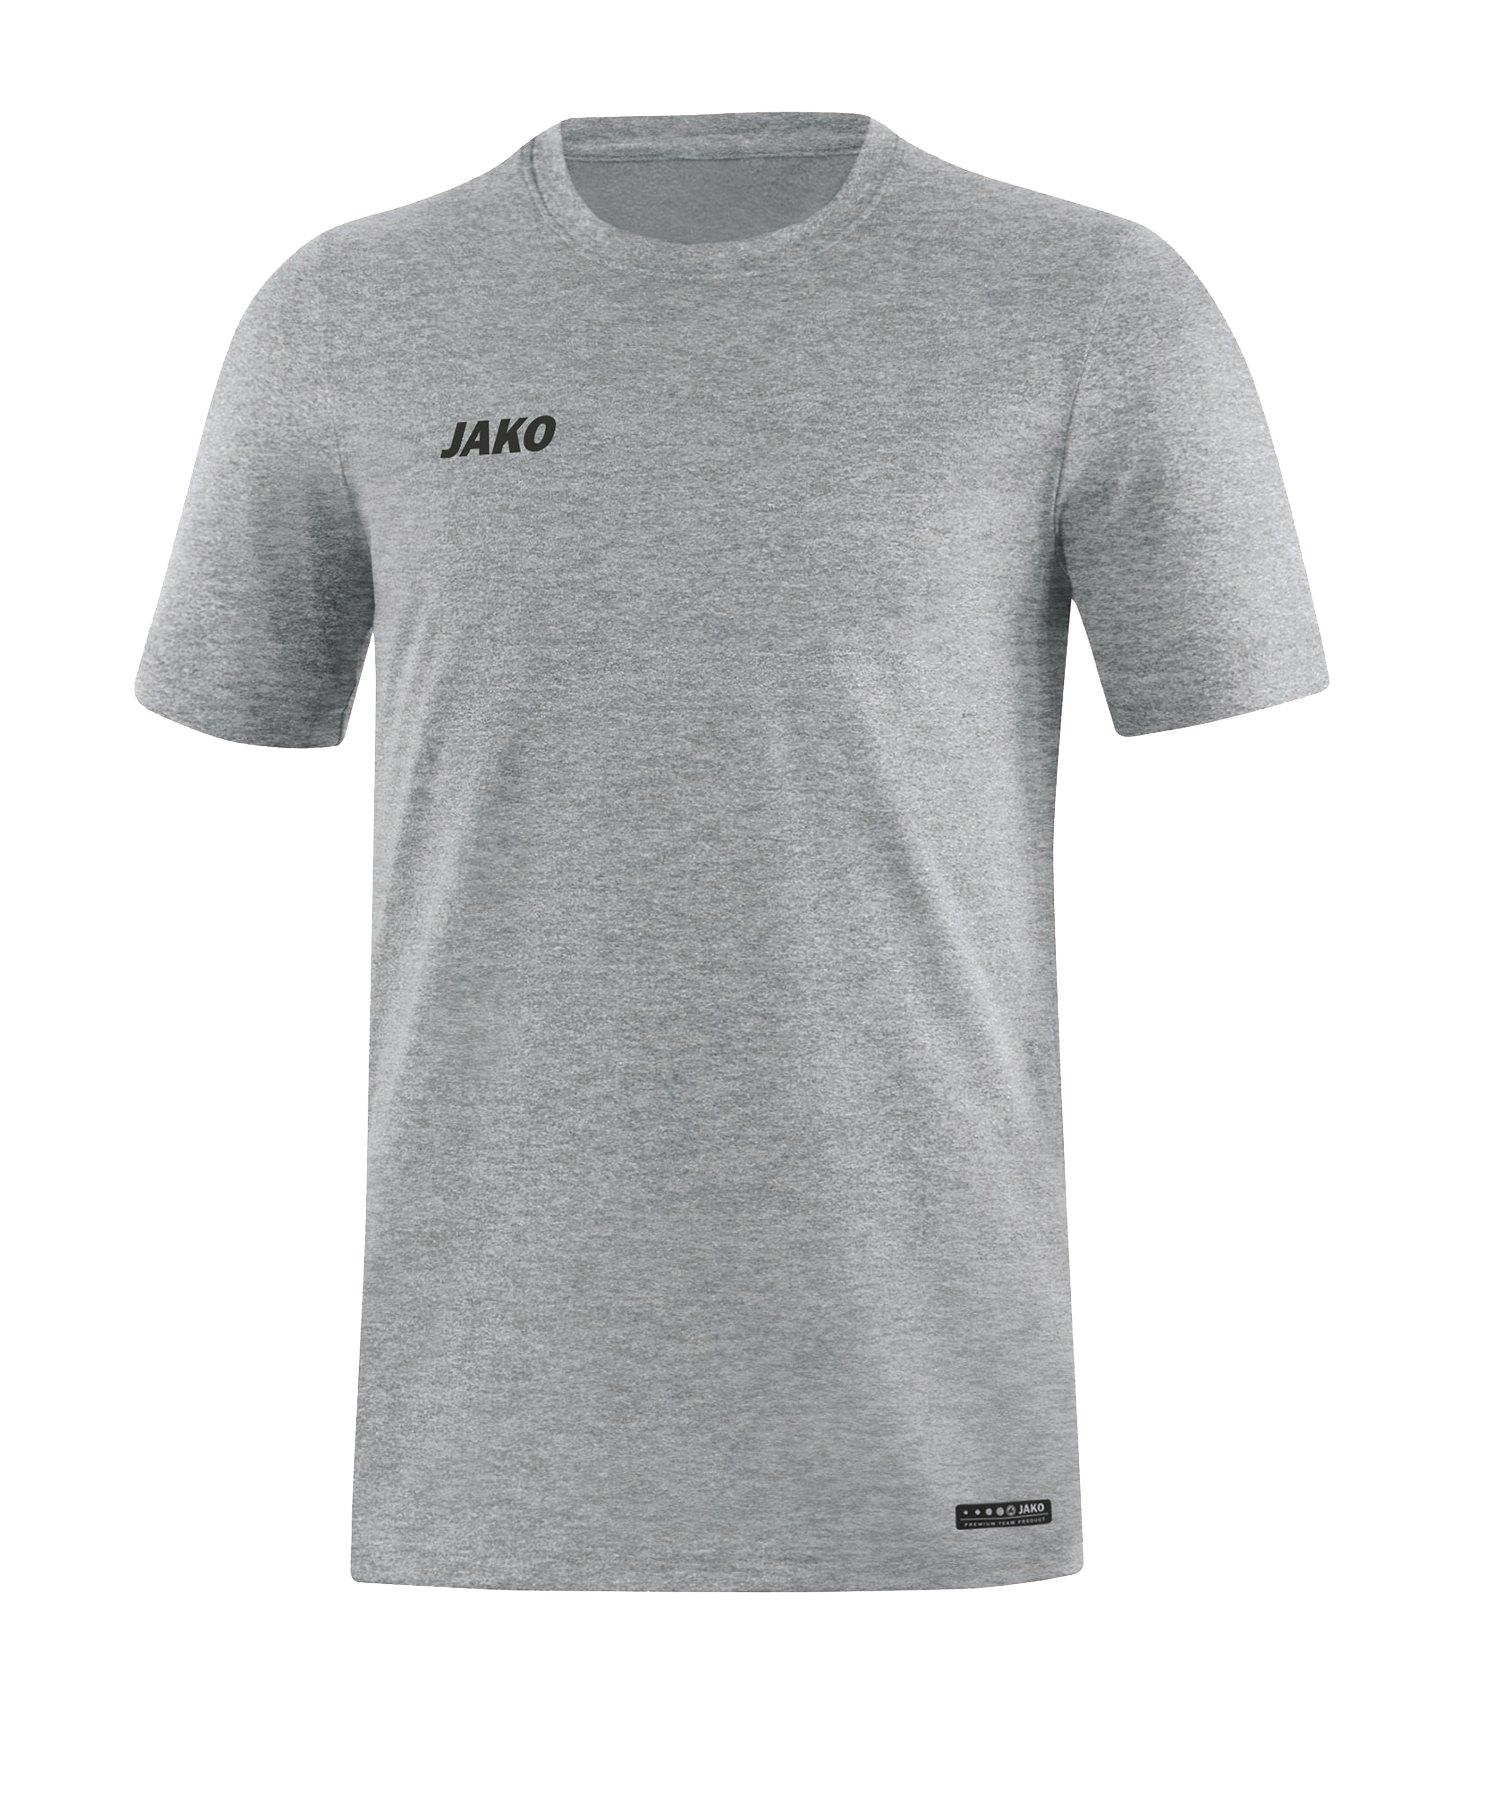 Jako T-Shirt Premium Basic Grau F40 - grau